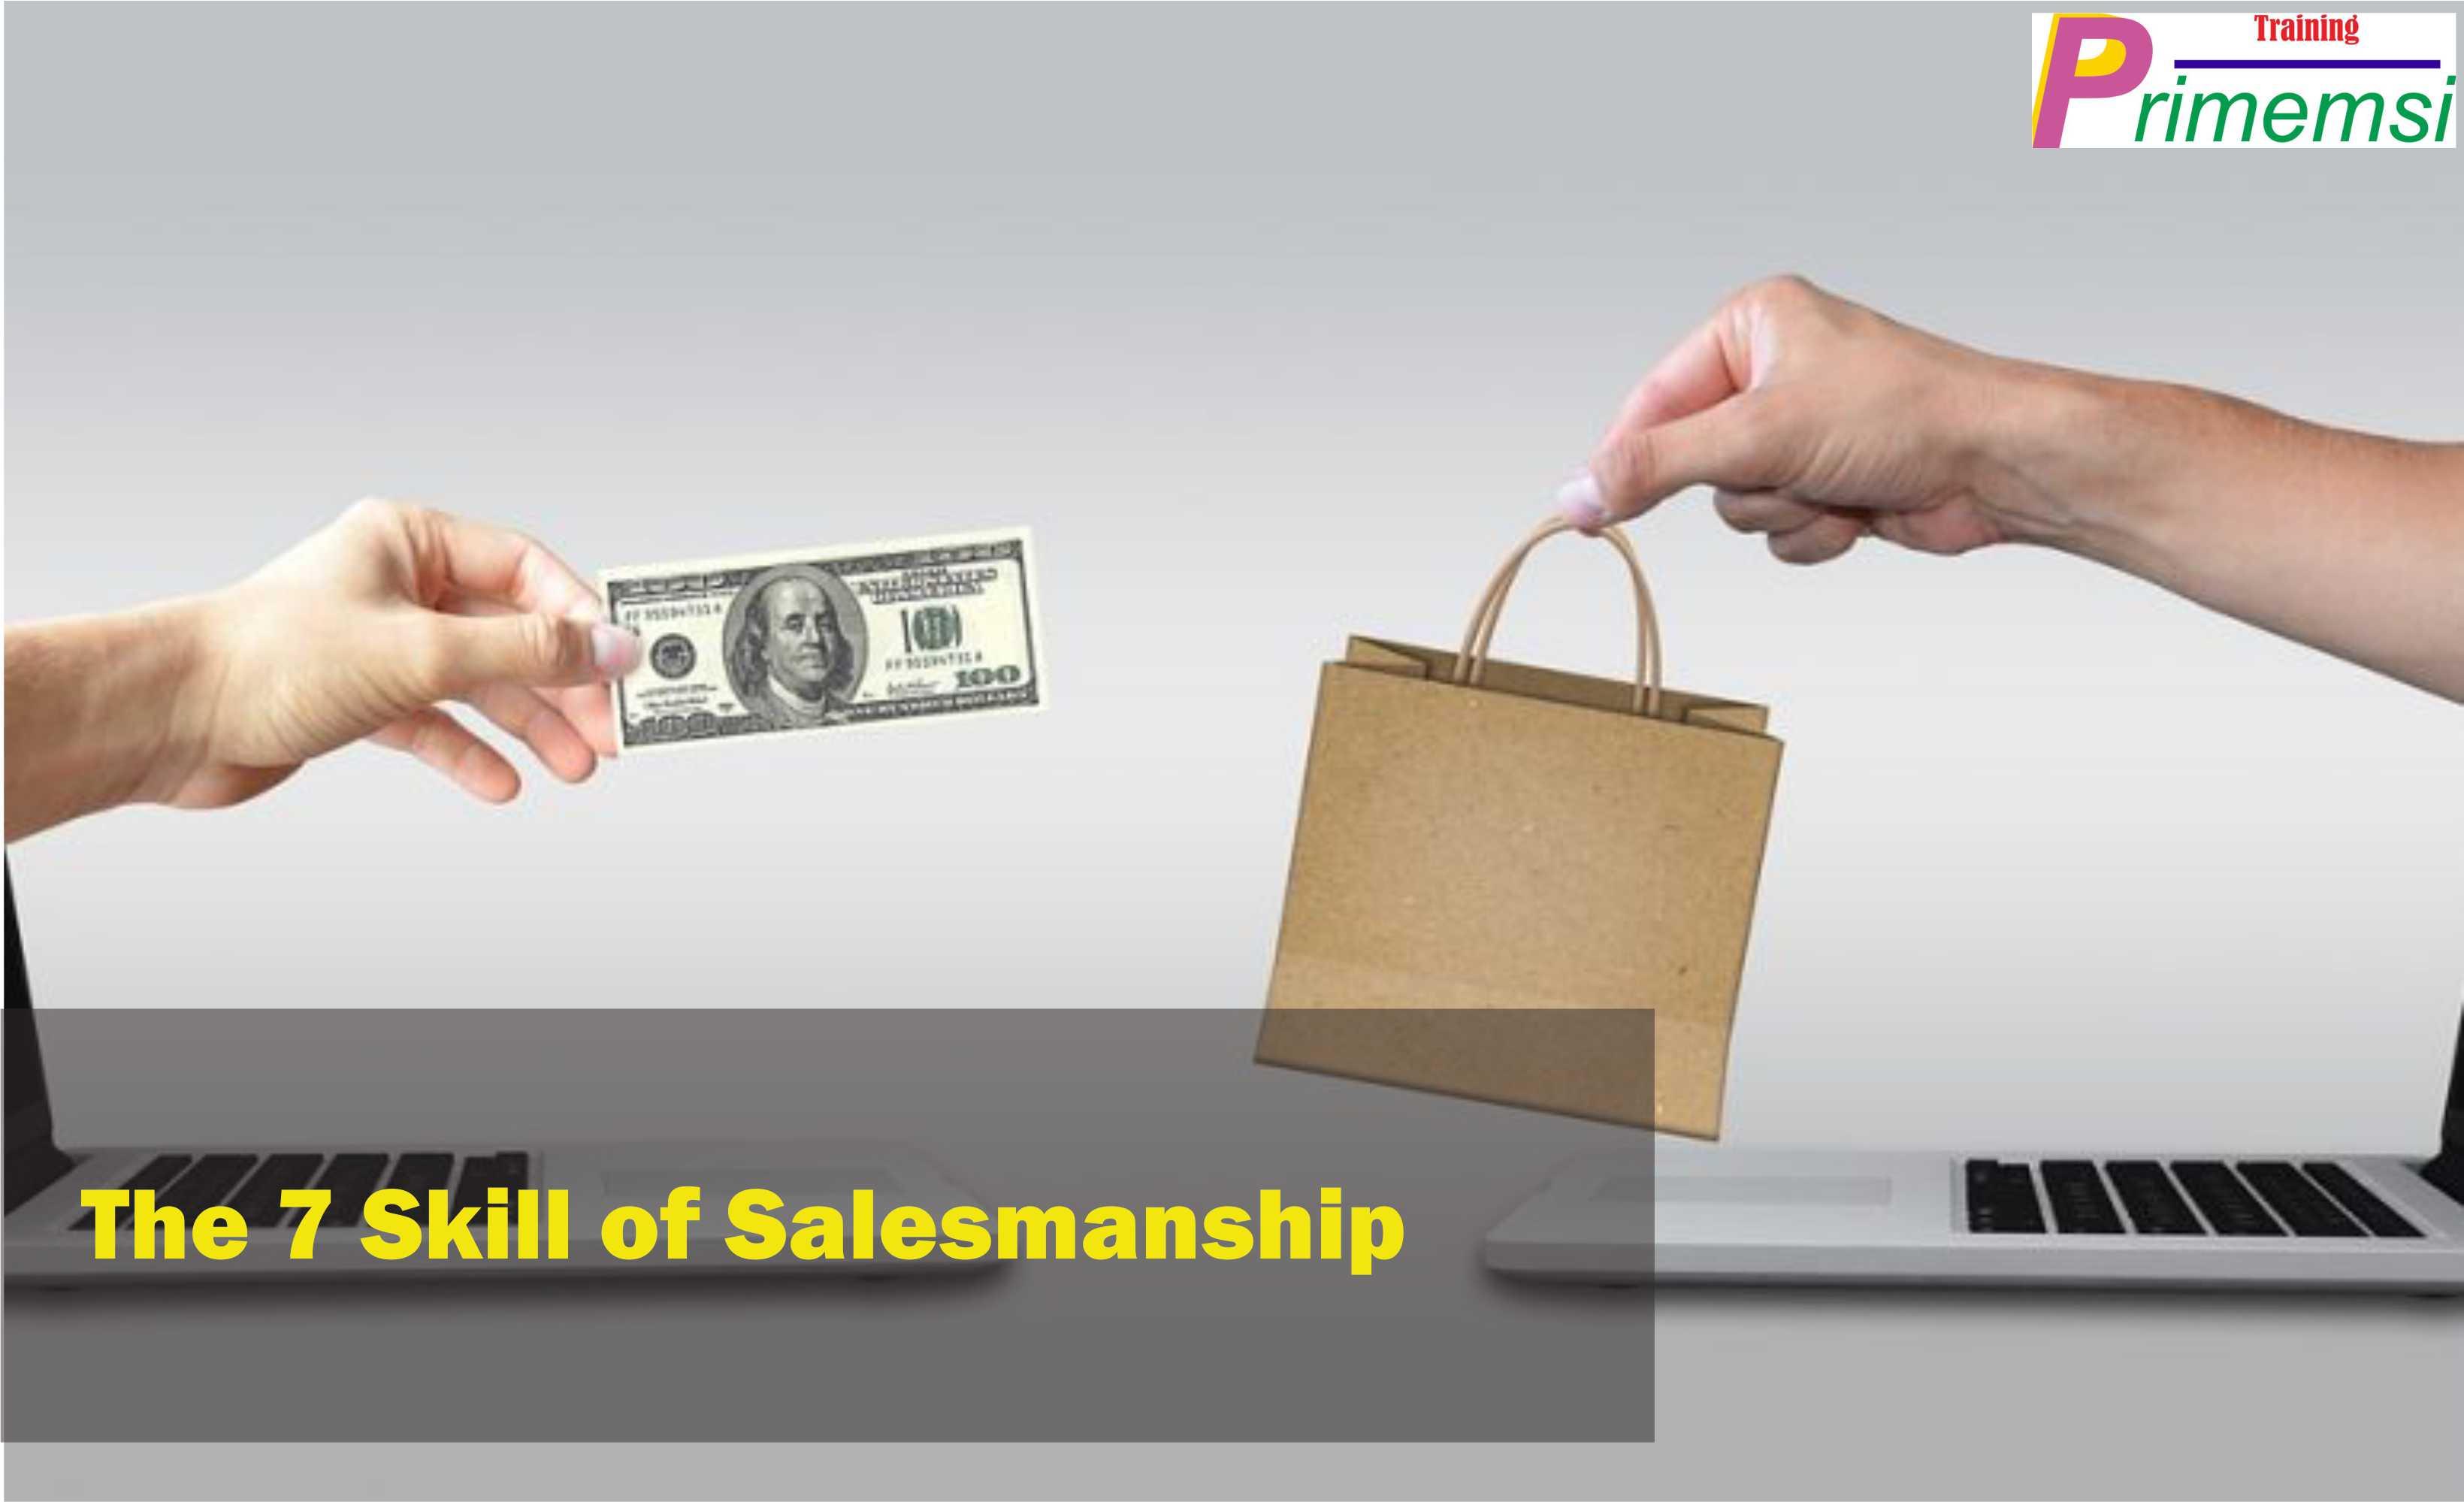 the 7 skill of salesmanship training